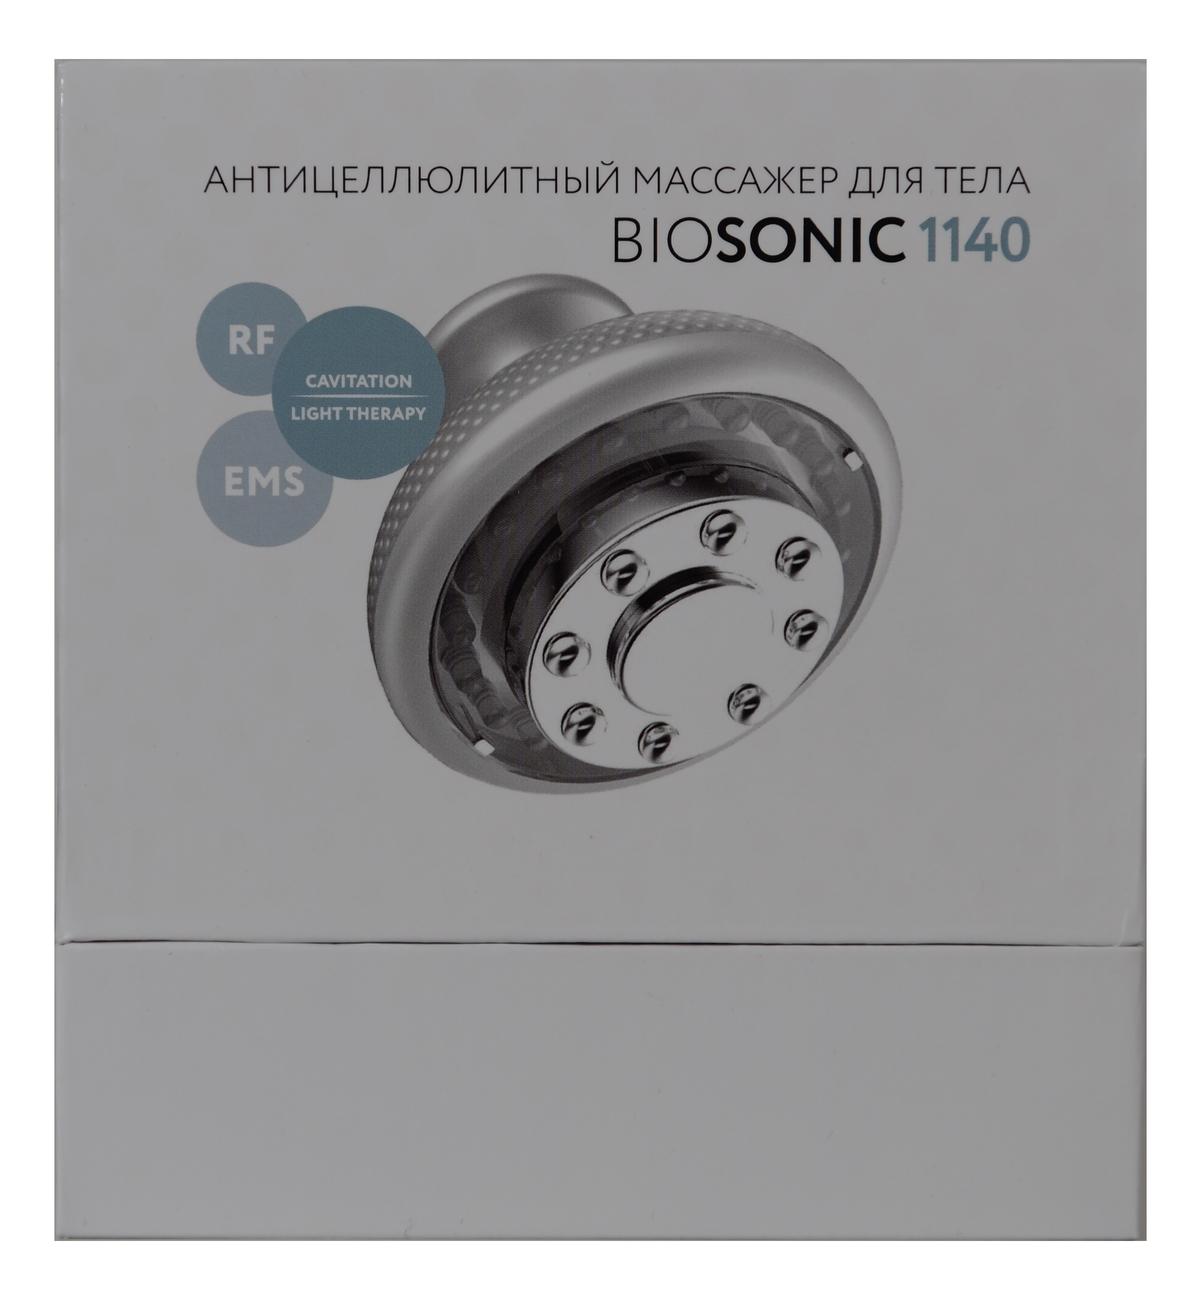 Антицеллюлитный массажер для тела Bio Sonic 1140 многофункциональный массажер для тела gezatone home health m141